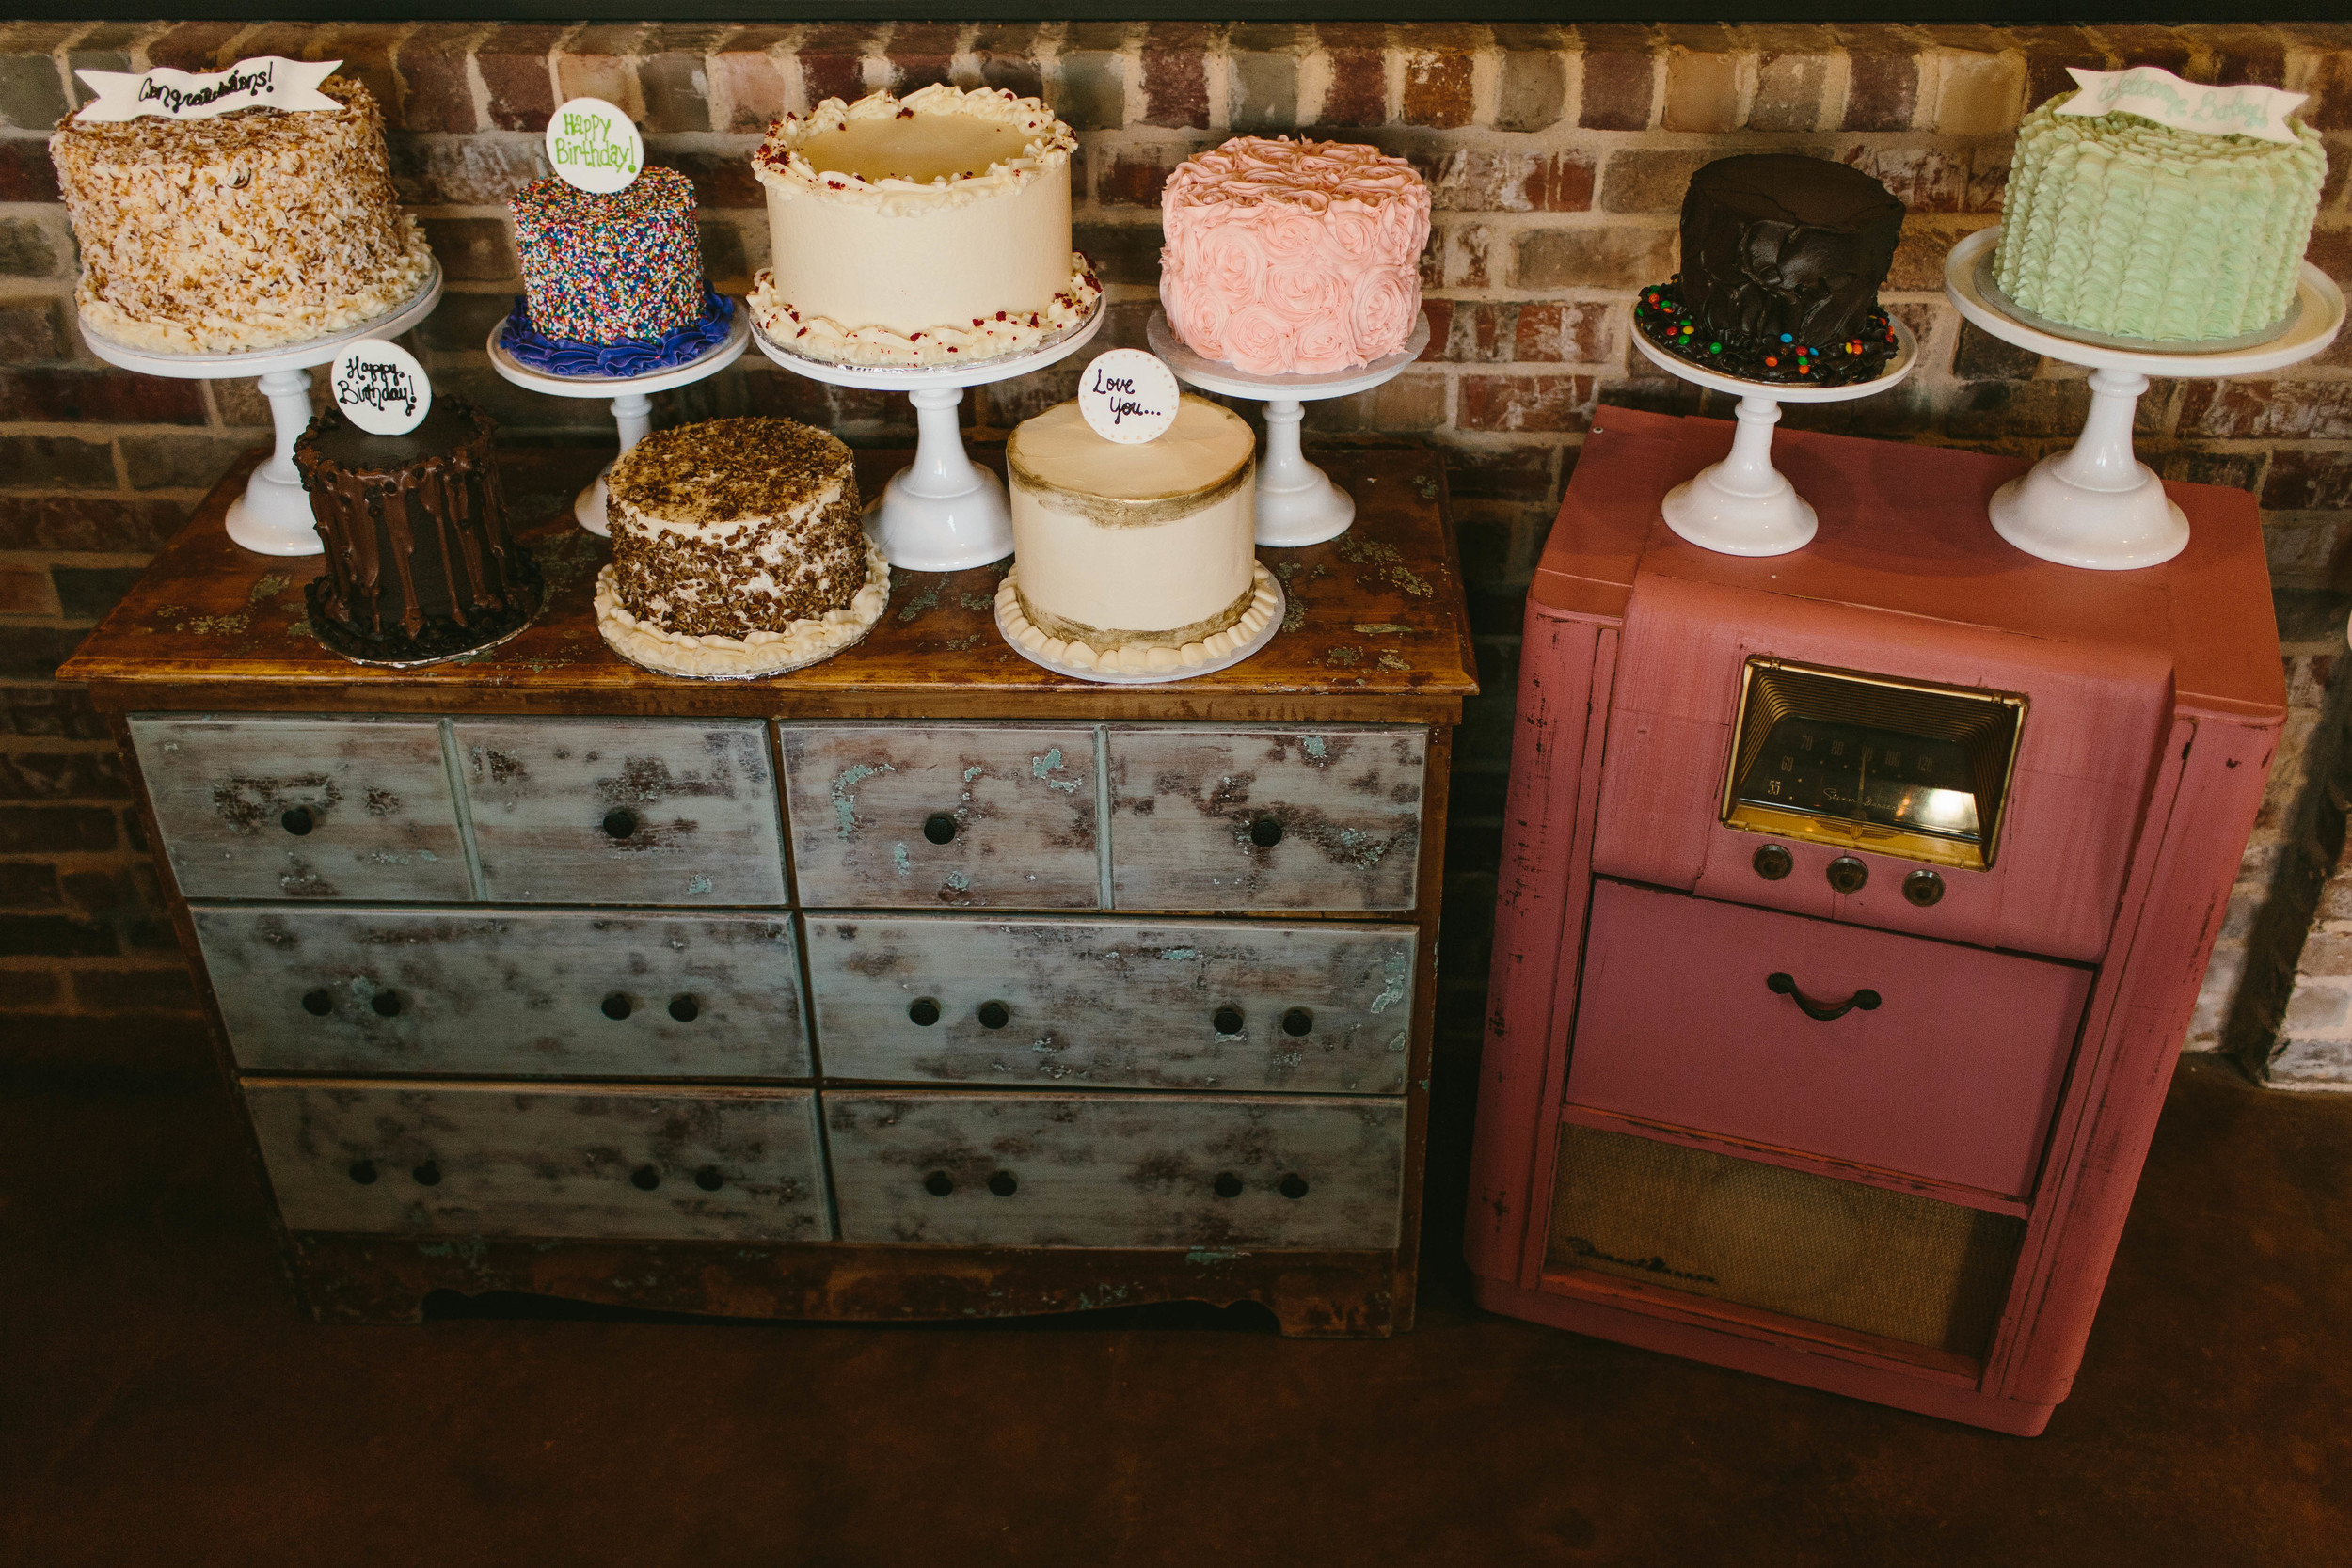 z_sugarbeesweets-cakes-groupshot.jpg